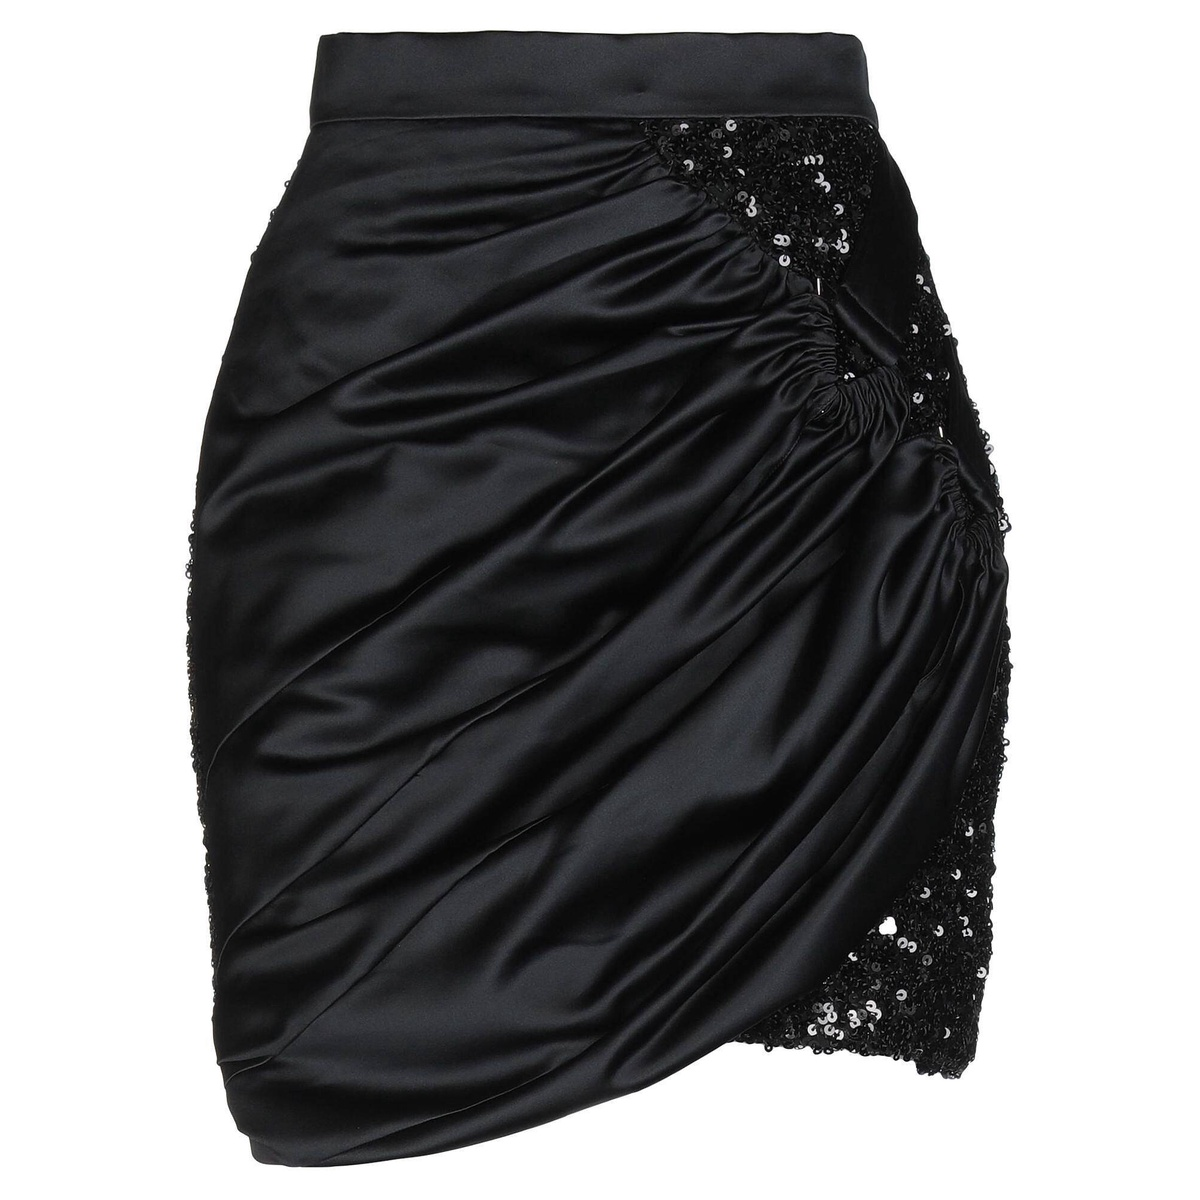 Purchasing redemption mini skirt womens 2021 new luxury wedding dress versatile Bridesmaid skirt